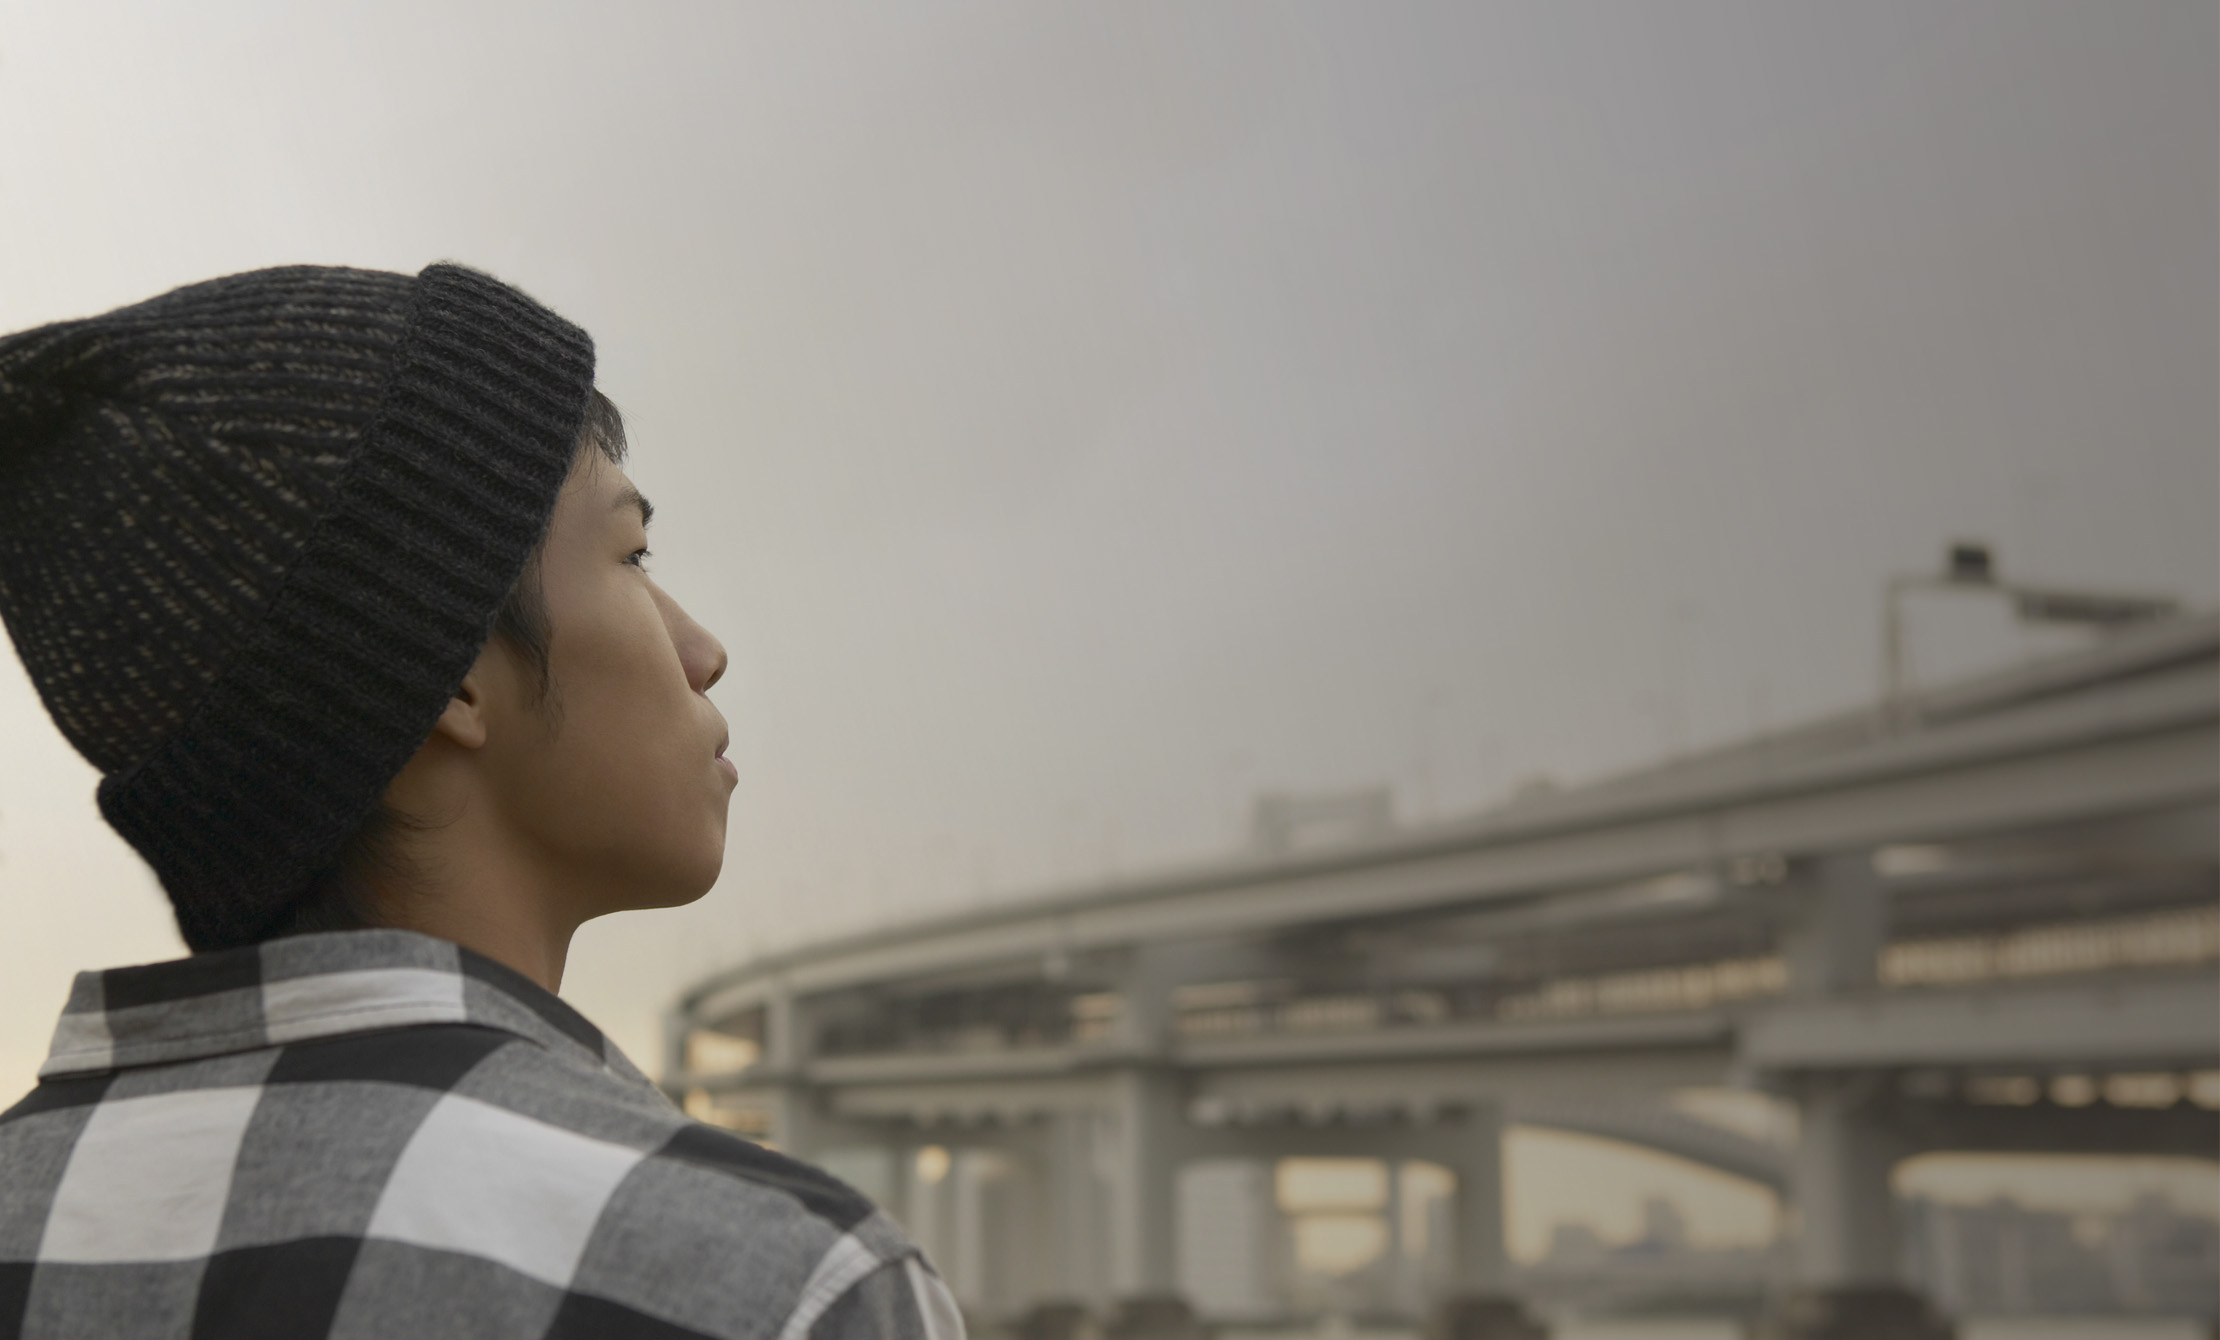 Young man in an urban setting looks toward the horizon   Jeune homme en milieu urbain regarde vers l'horizon